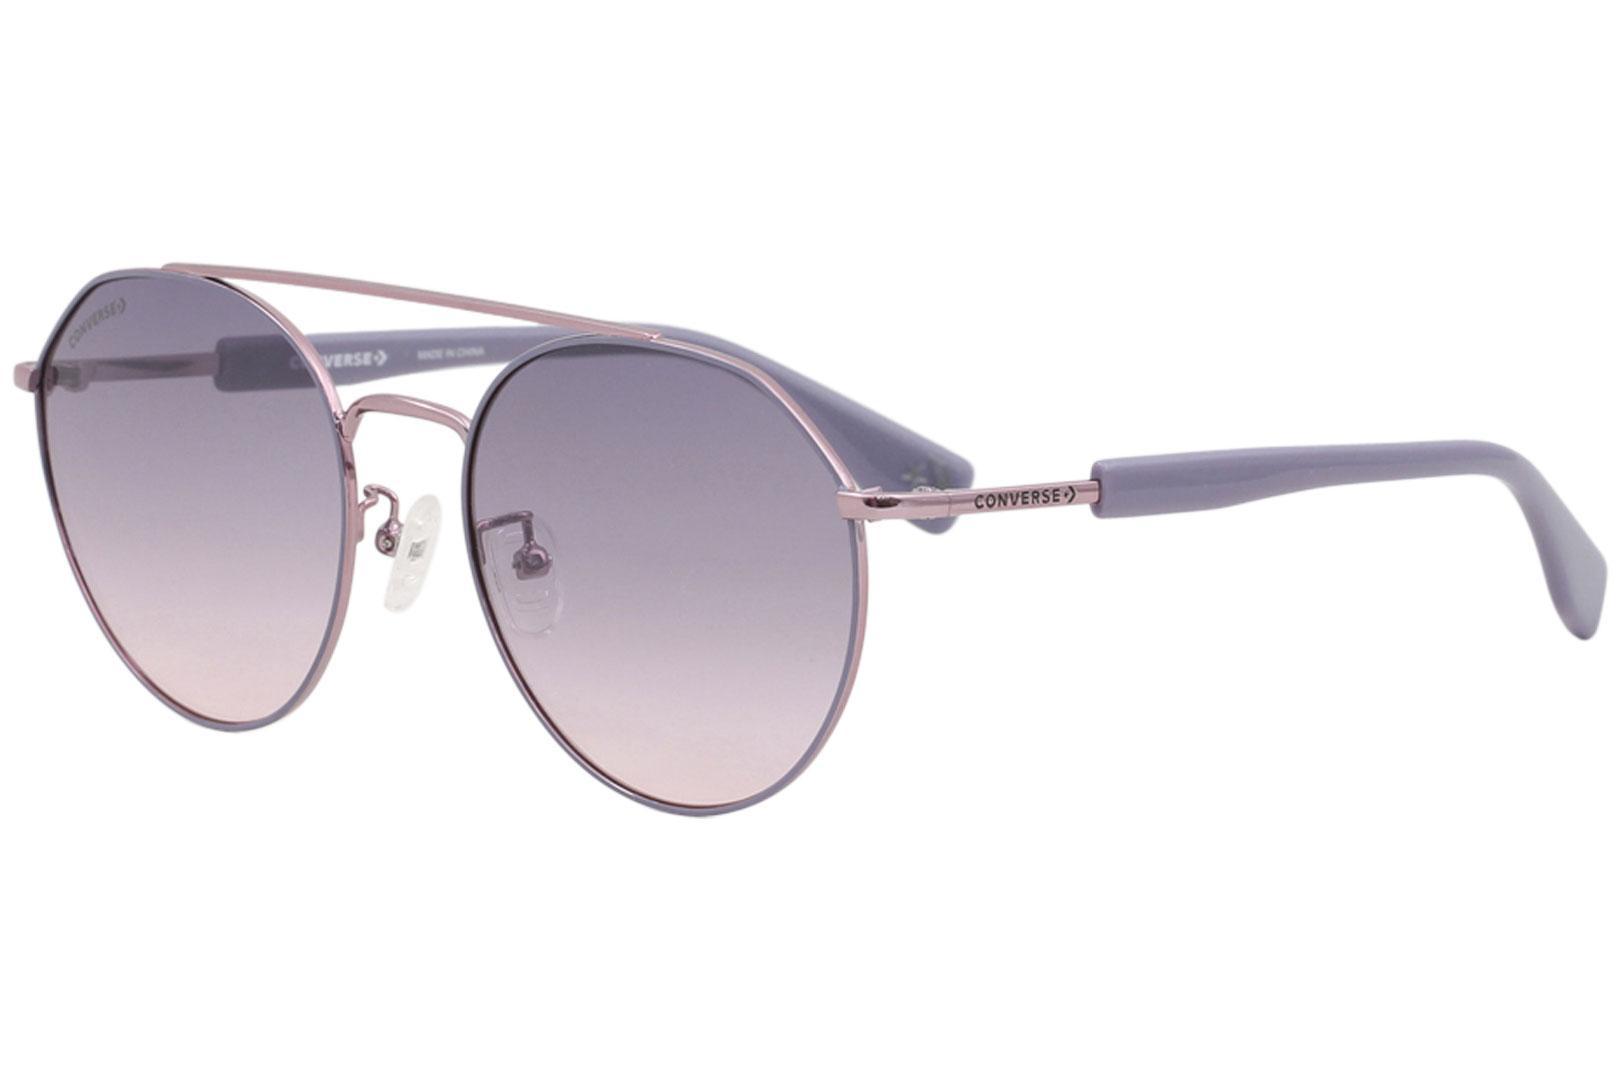 8cbb150beec Converse Women s SCO053 SCO 053 Fashion Pilot Sunglasses